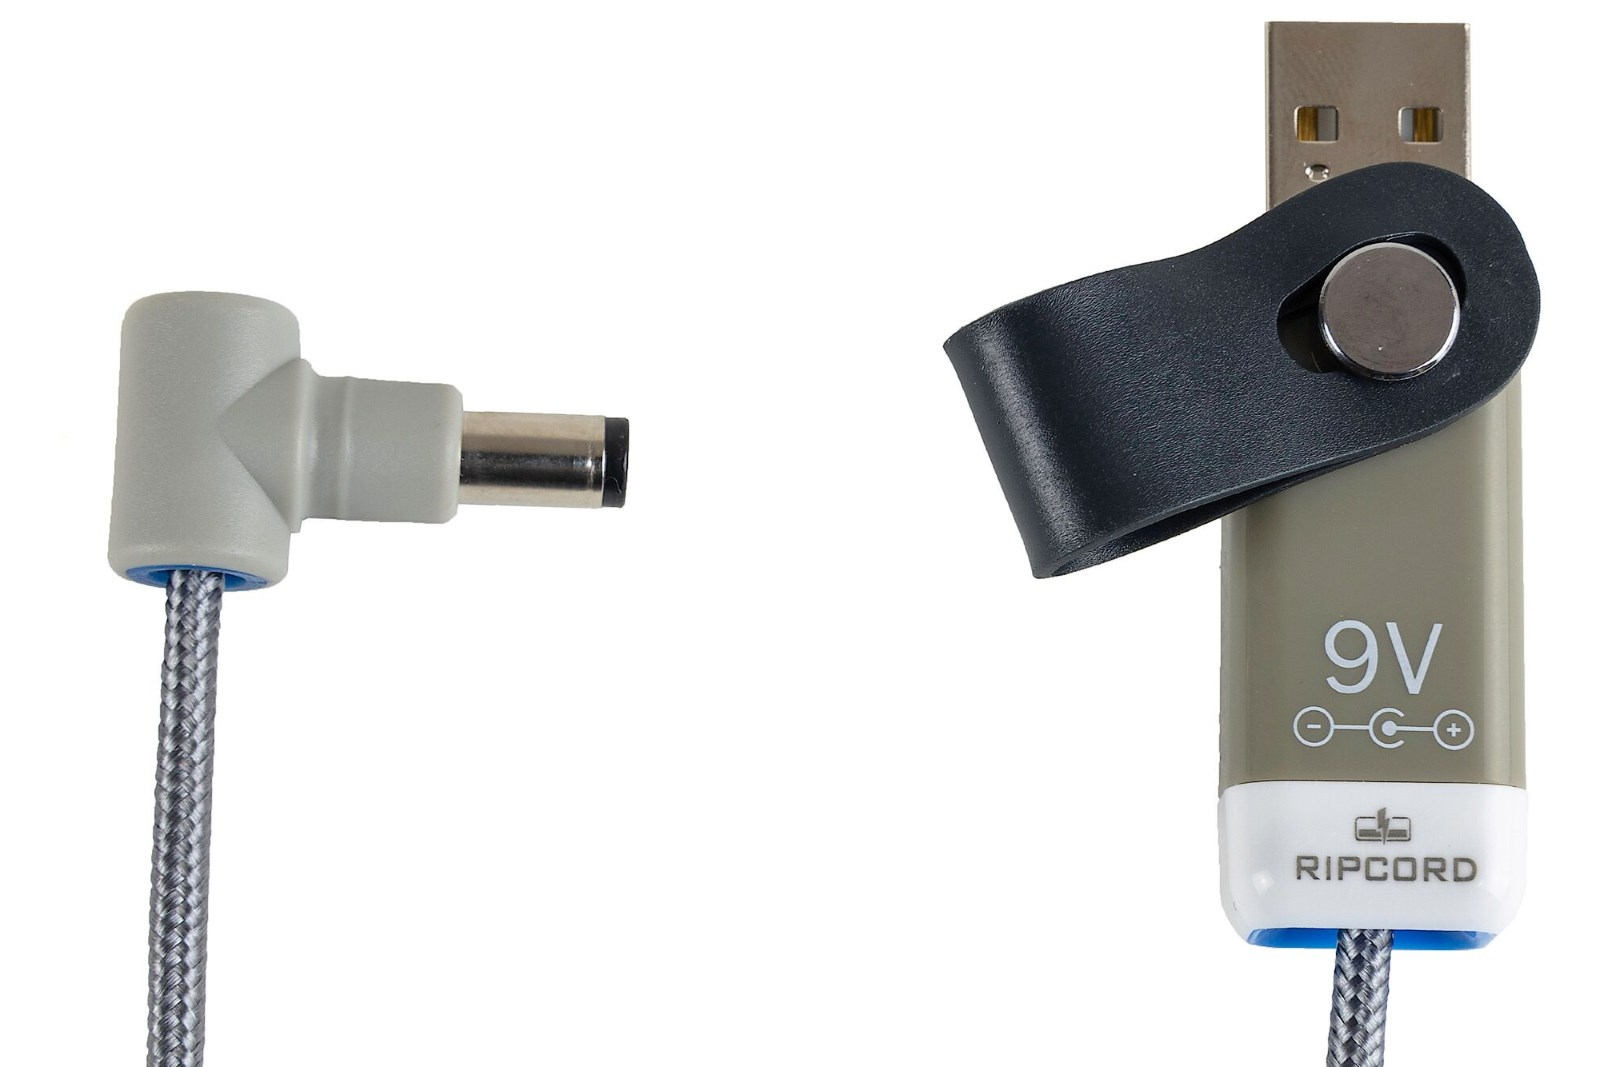 US Plug MyVolts 12V Power Supply Adaptor Compatible with Yamaha P-90 Keyboard